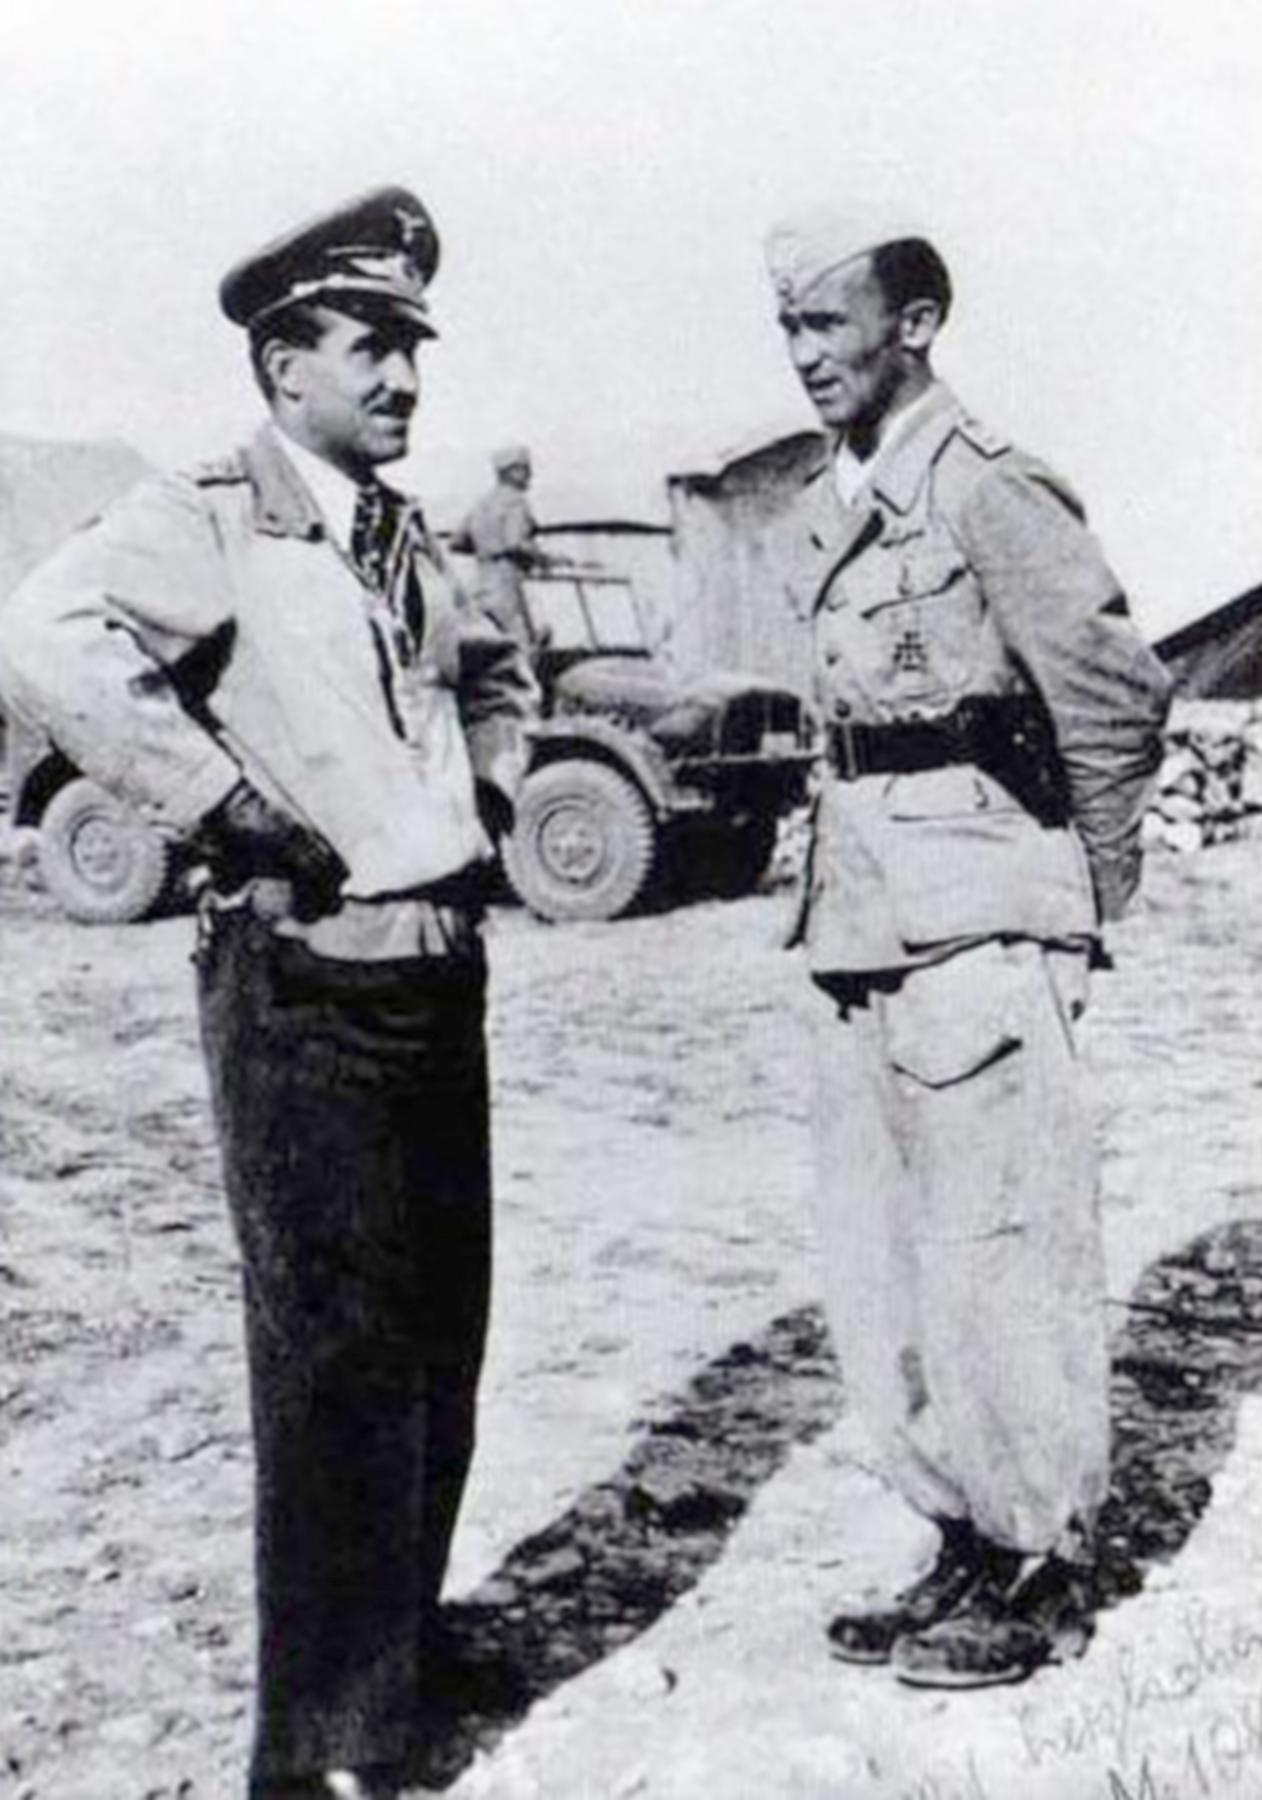 Aircrew Luftwaffe JG27 ace Eduard Neumann n Adolf Galland in North Africa Sep 22 1942 01